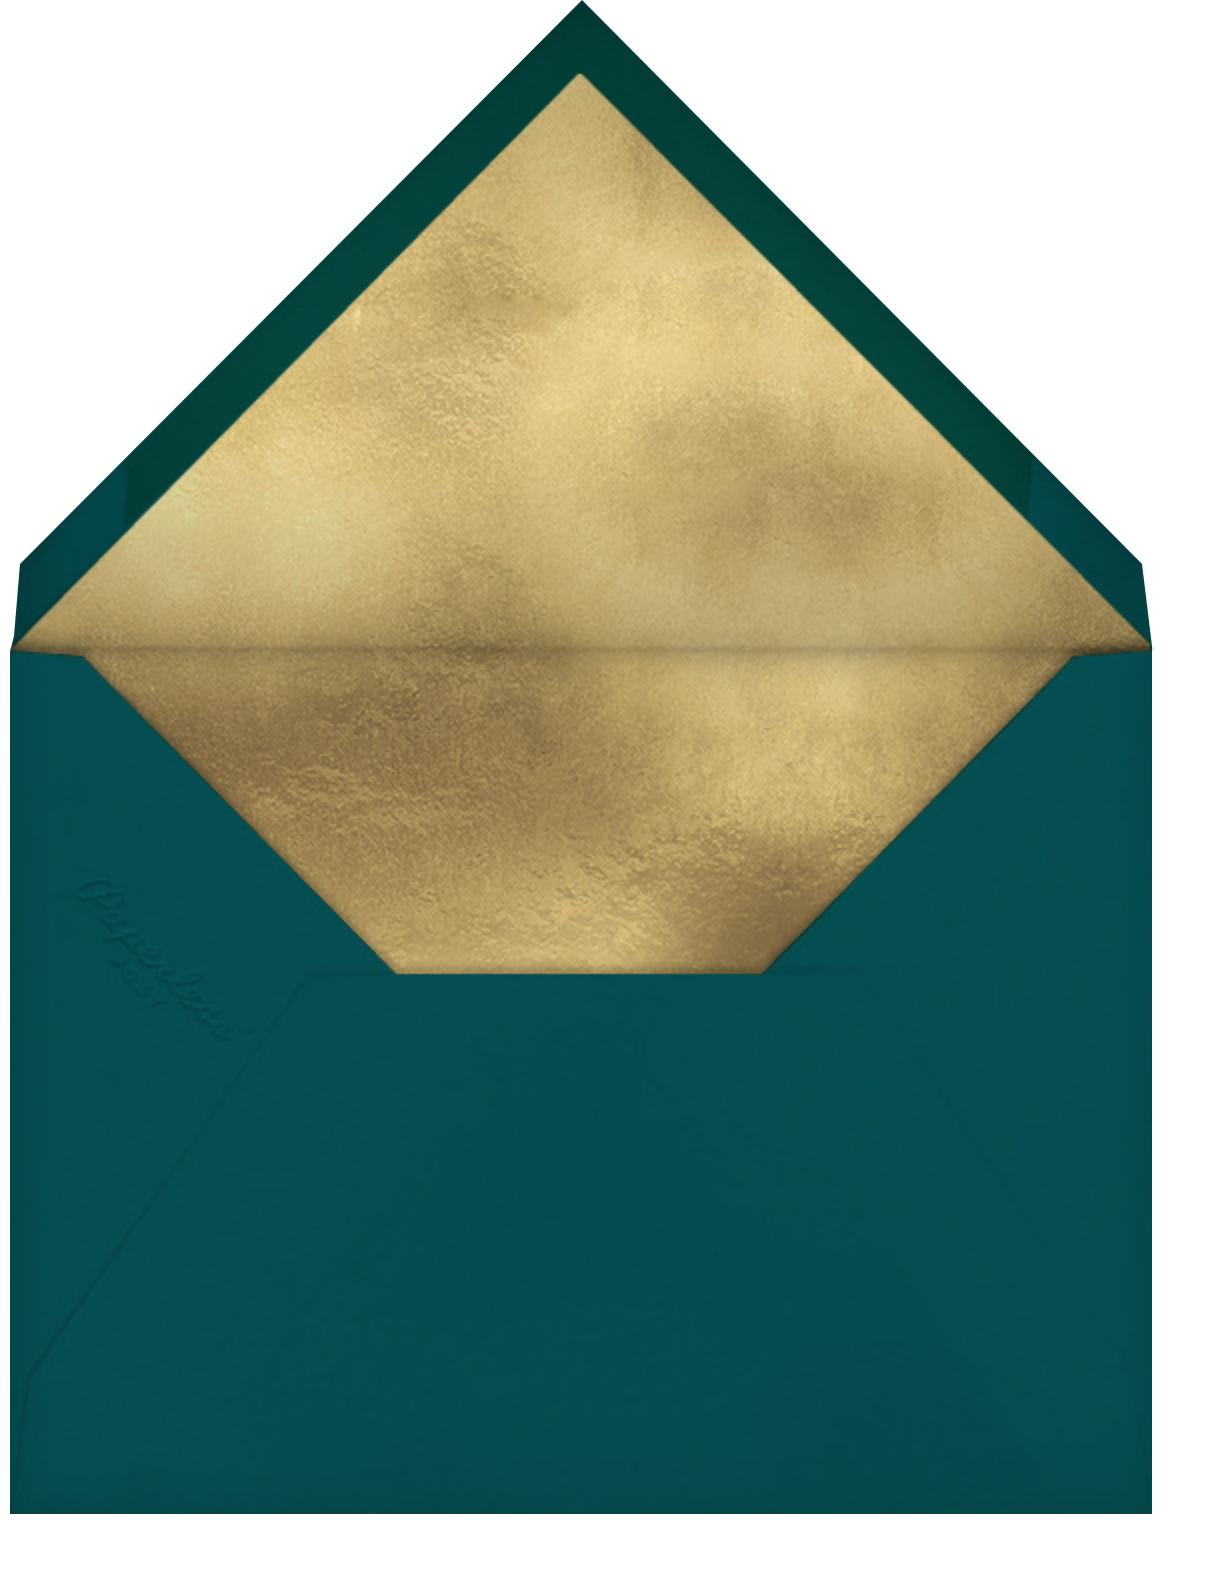 Greenery Garland - Meri Meri - Christmas party - envelope back